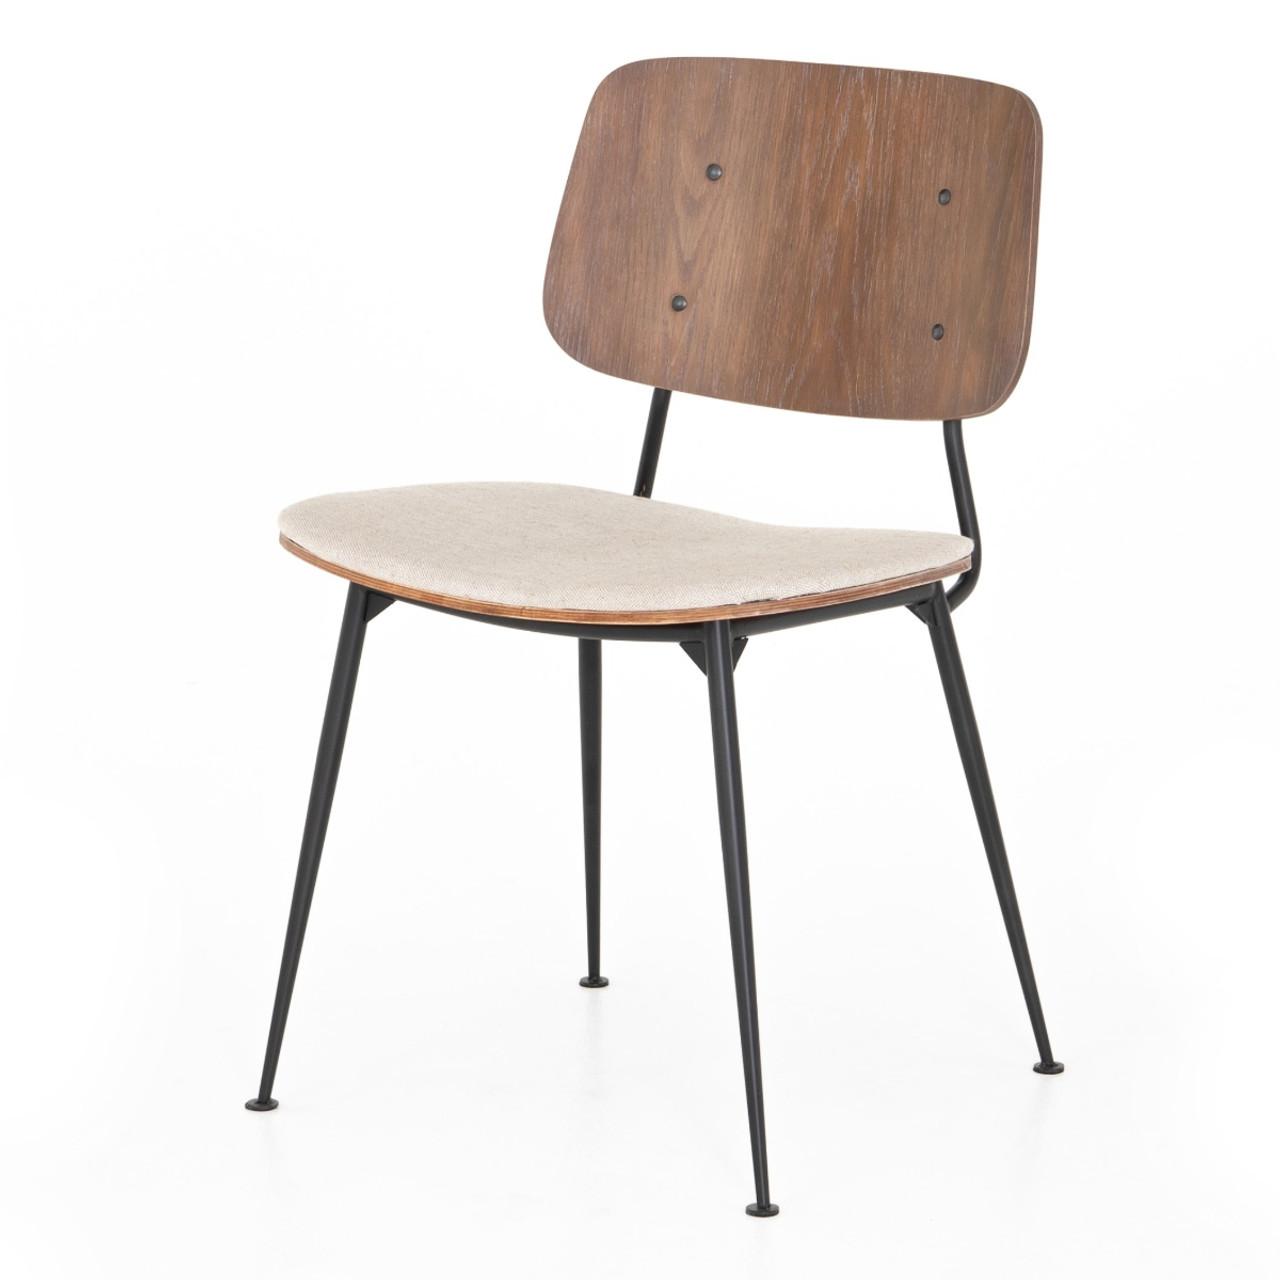 Admirable Hewitt Mid Century Modern Ply Dining Chair Machost Co Dining Chair Design Ideas Machostcouk